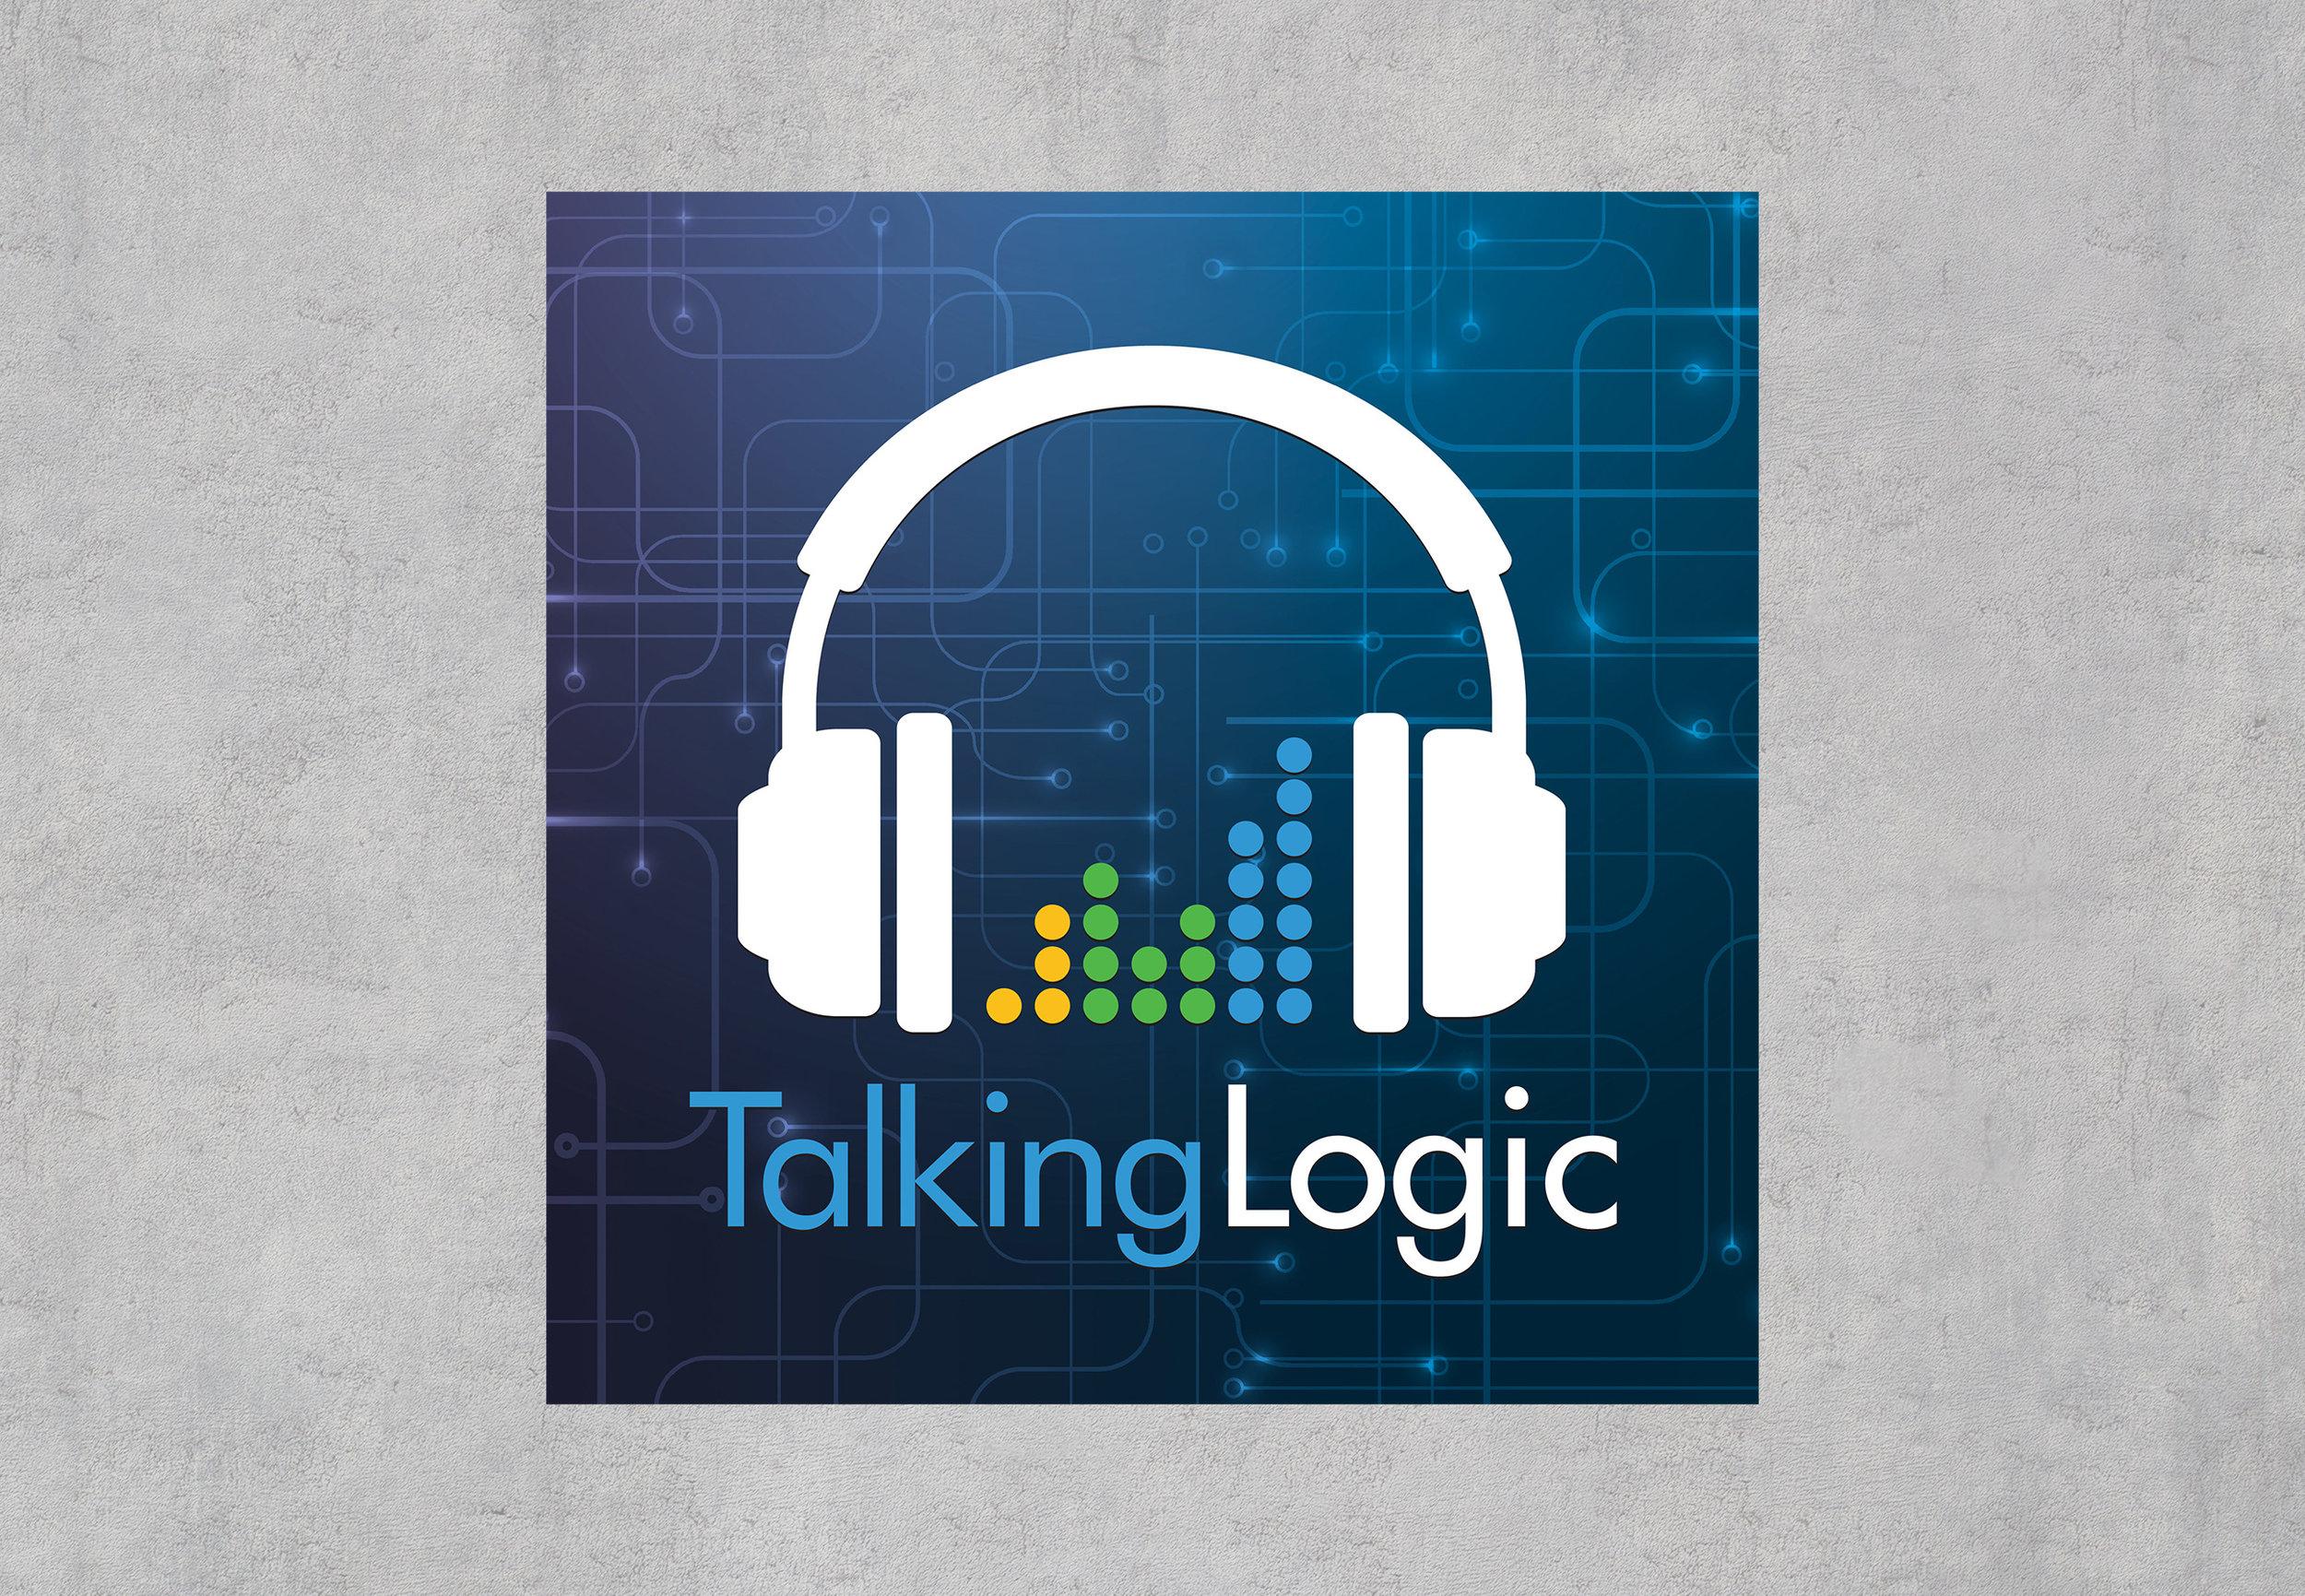 ScienceLogic TalkingLogic Podcast Logo